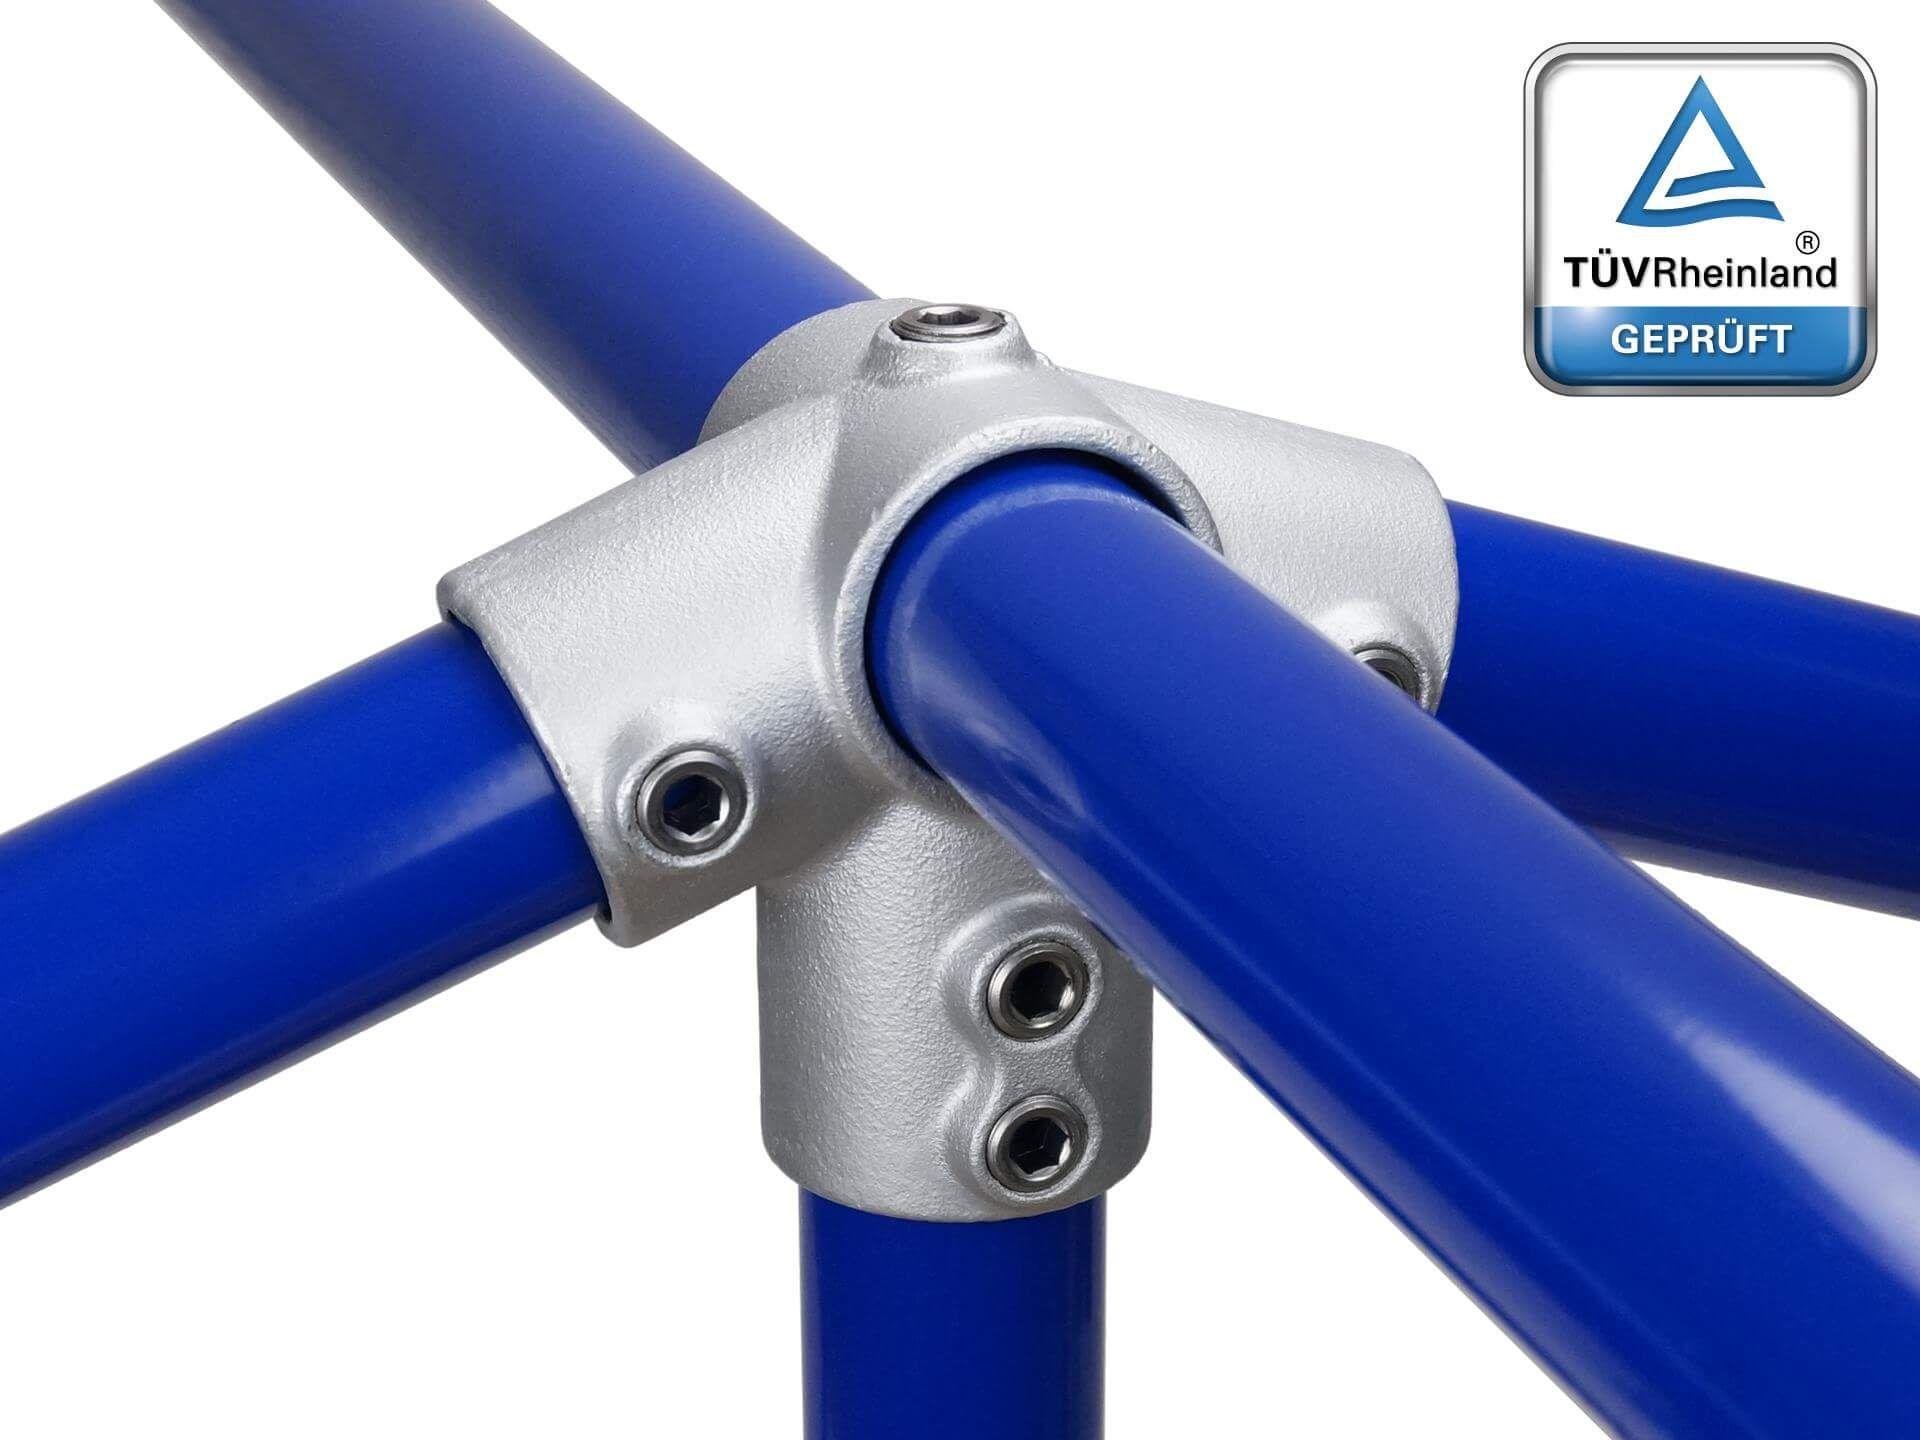 Rohrverbinder Stahlguss Tc 48 3mm 6 4 Dach Giebel